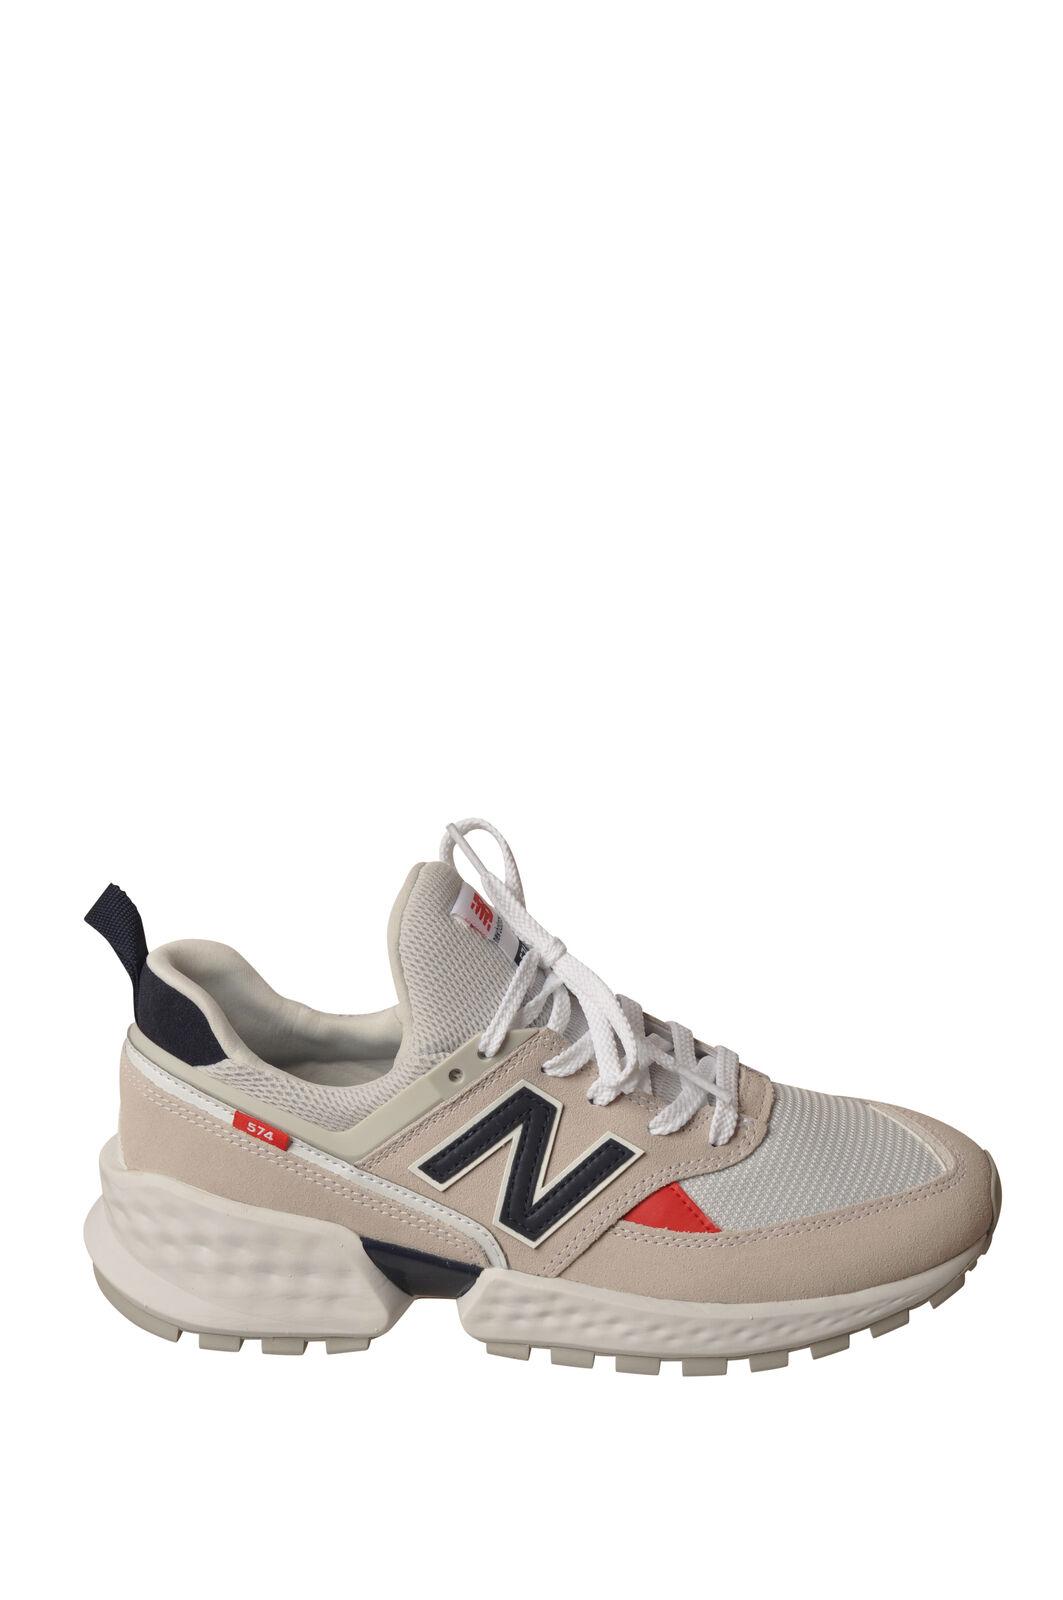 New Balance - zapatos-Stringate - hombres - Bianco - 6221330C190704